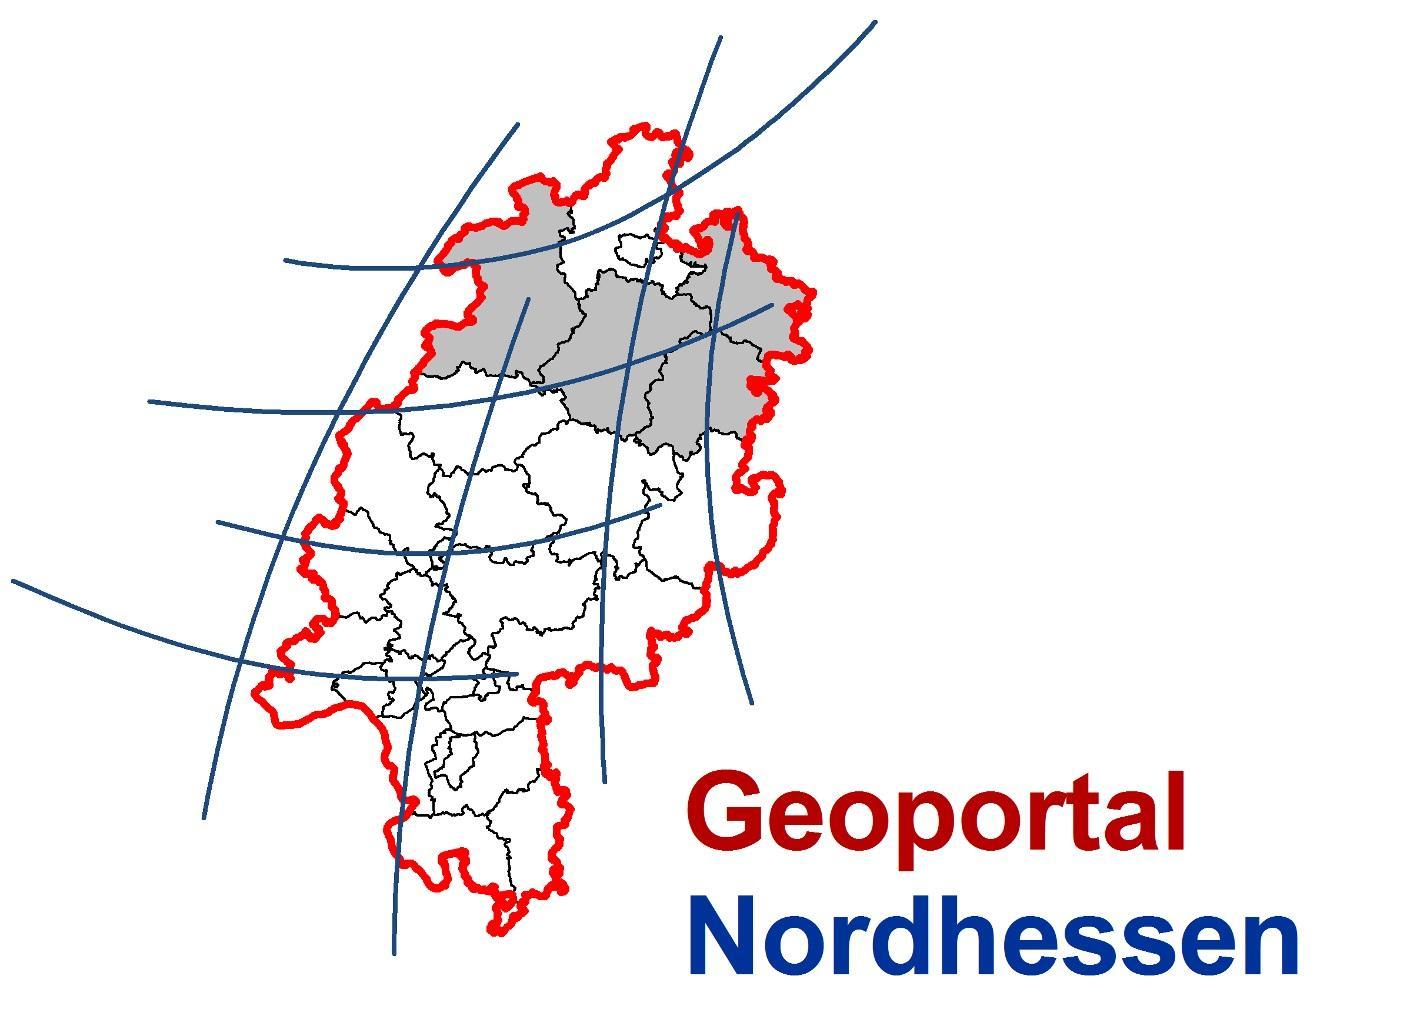 Geoportal Nordhessen